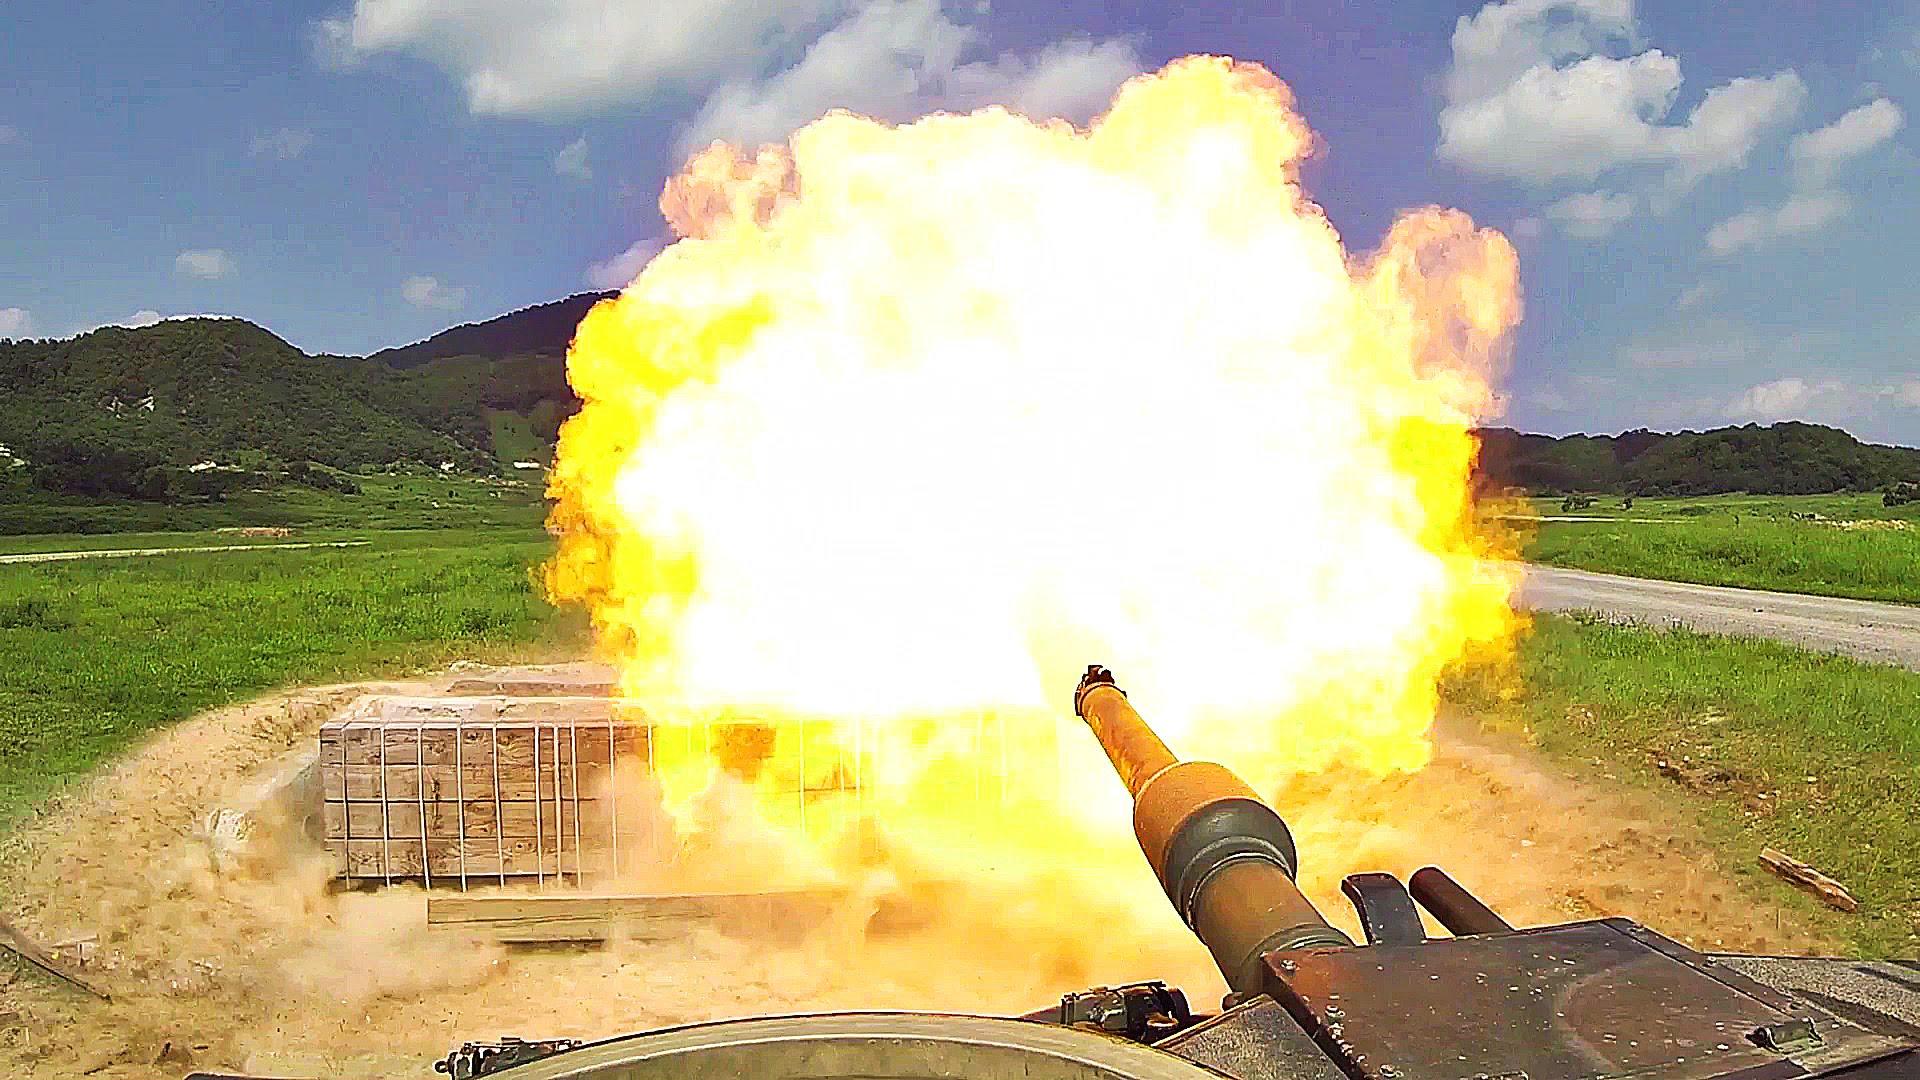 M1 Abrams Main Battle Tanks On The Range